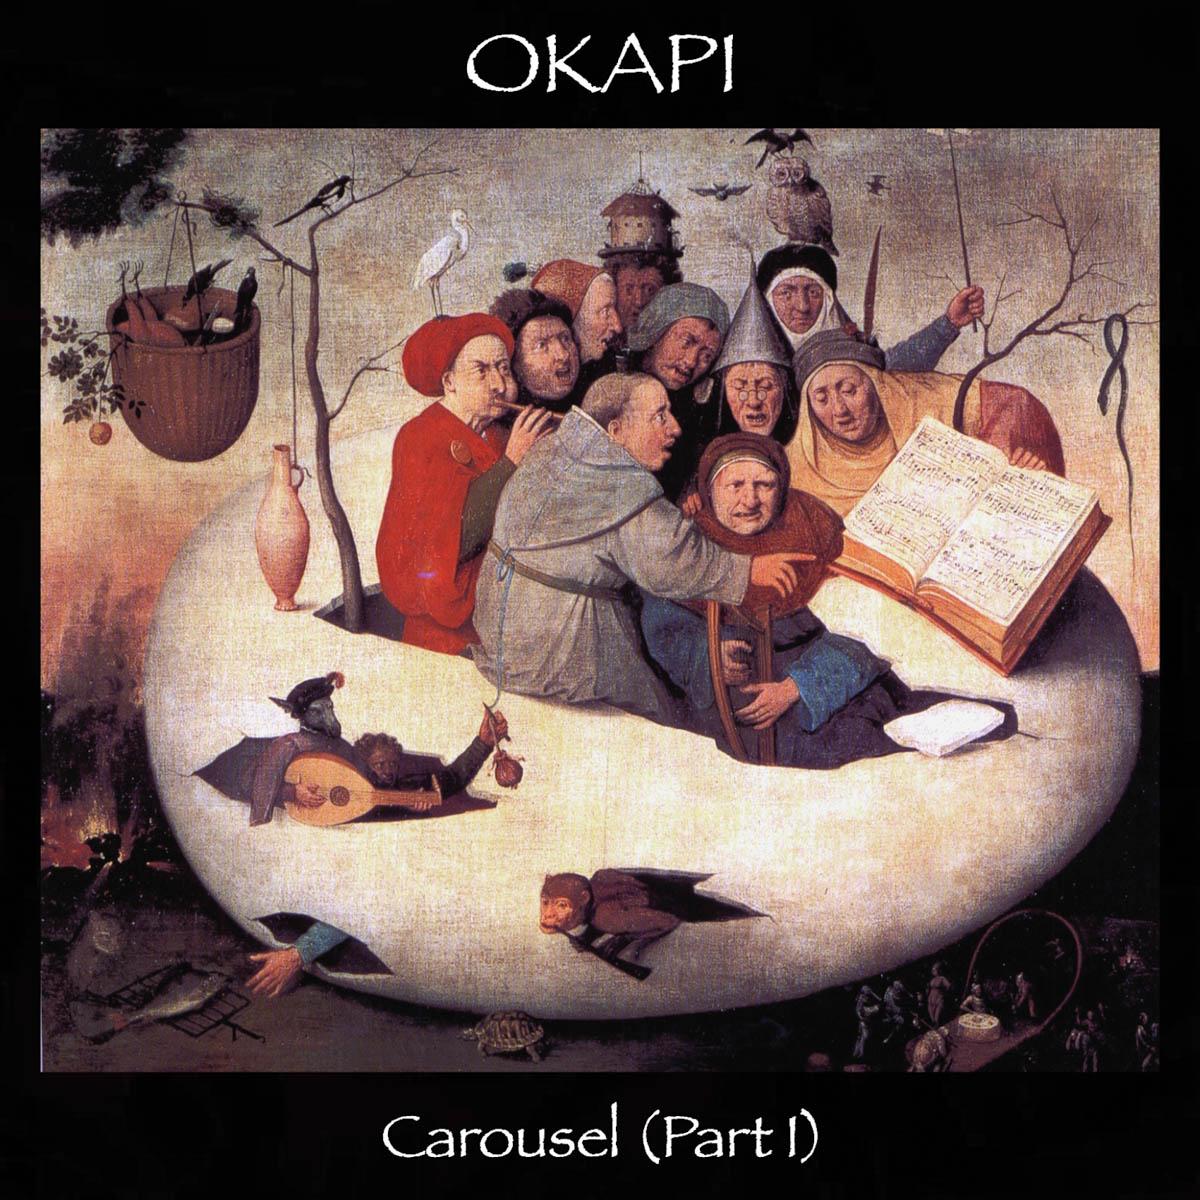 Okapi: Carousel (Part I)